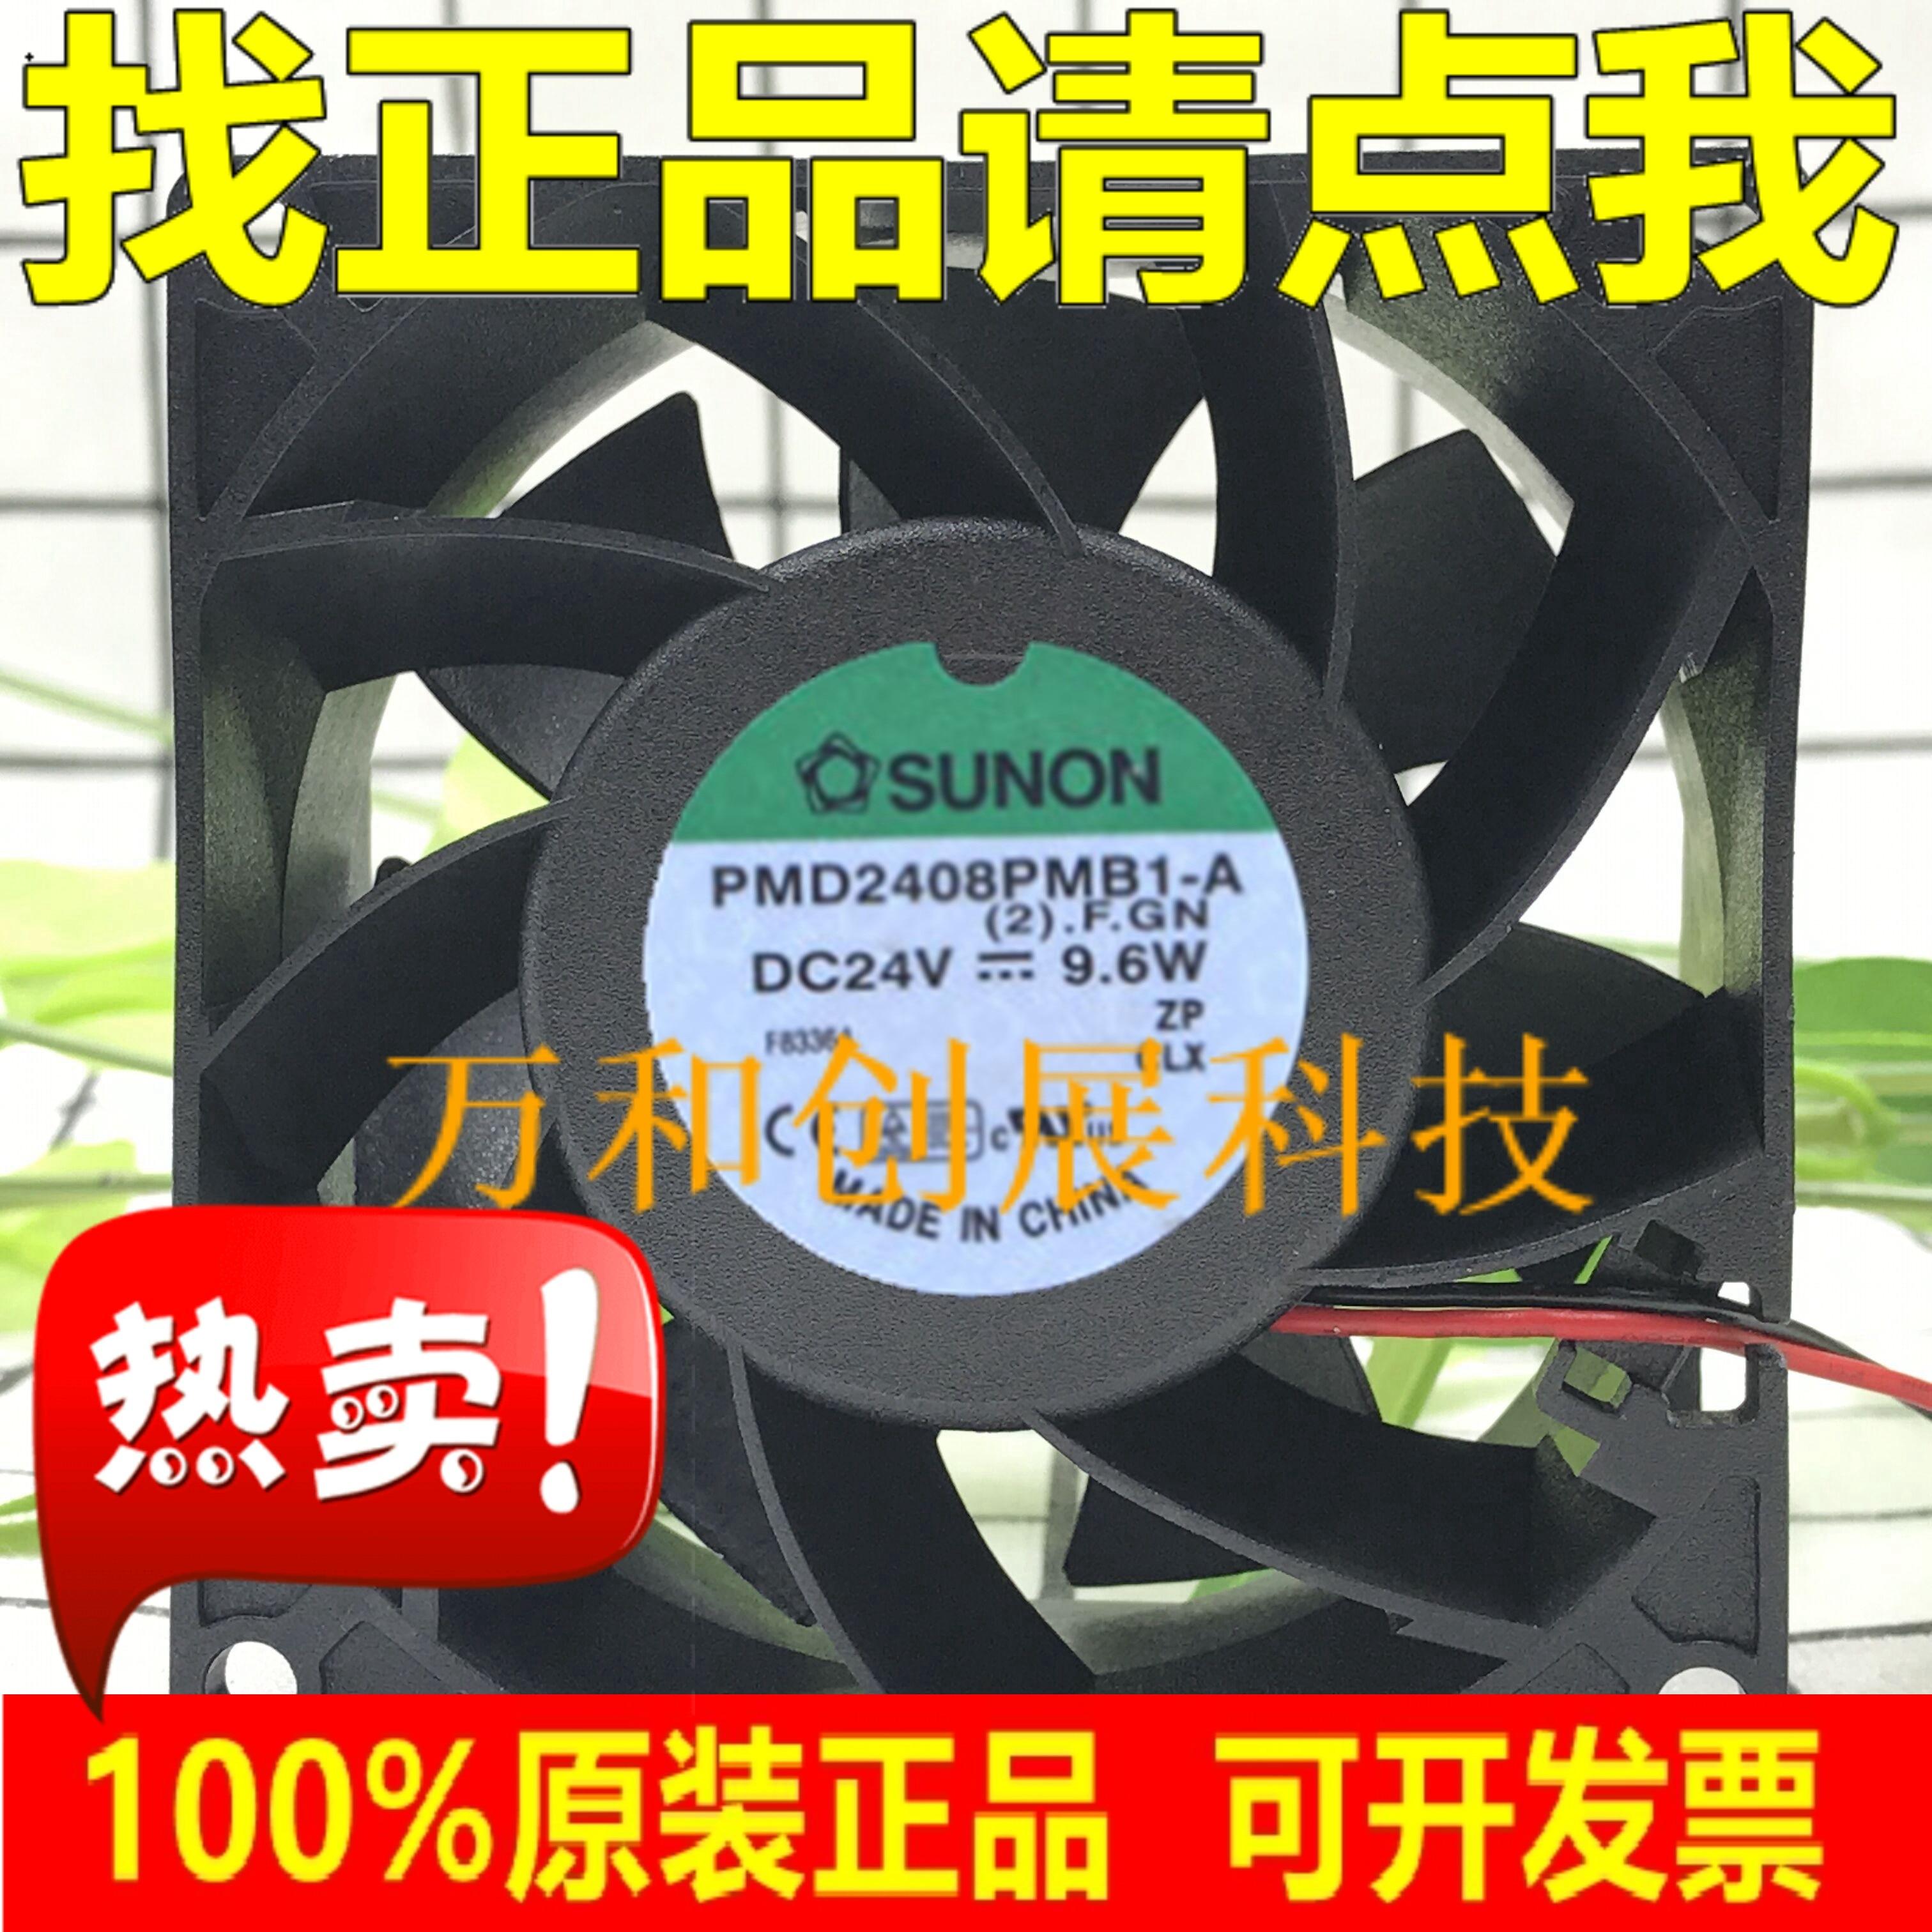 Sunon PMD2408PMB1-A/8038/dc24v 9.6 w grande volume de ar 8 cm ventilador